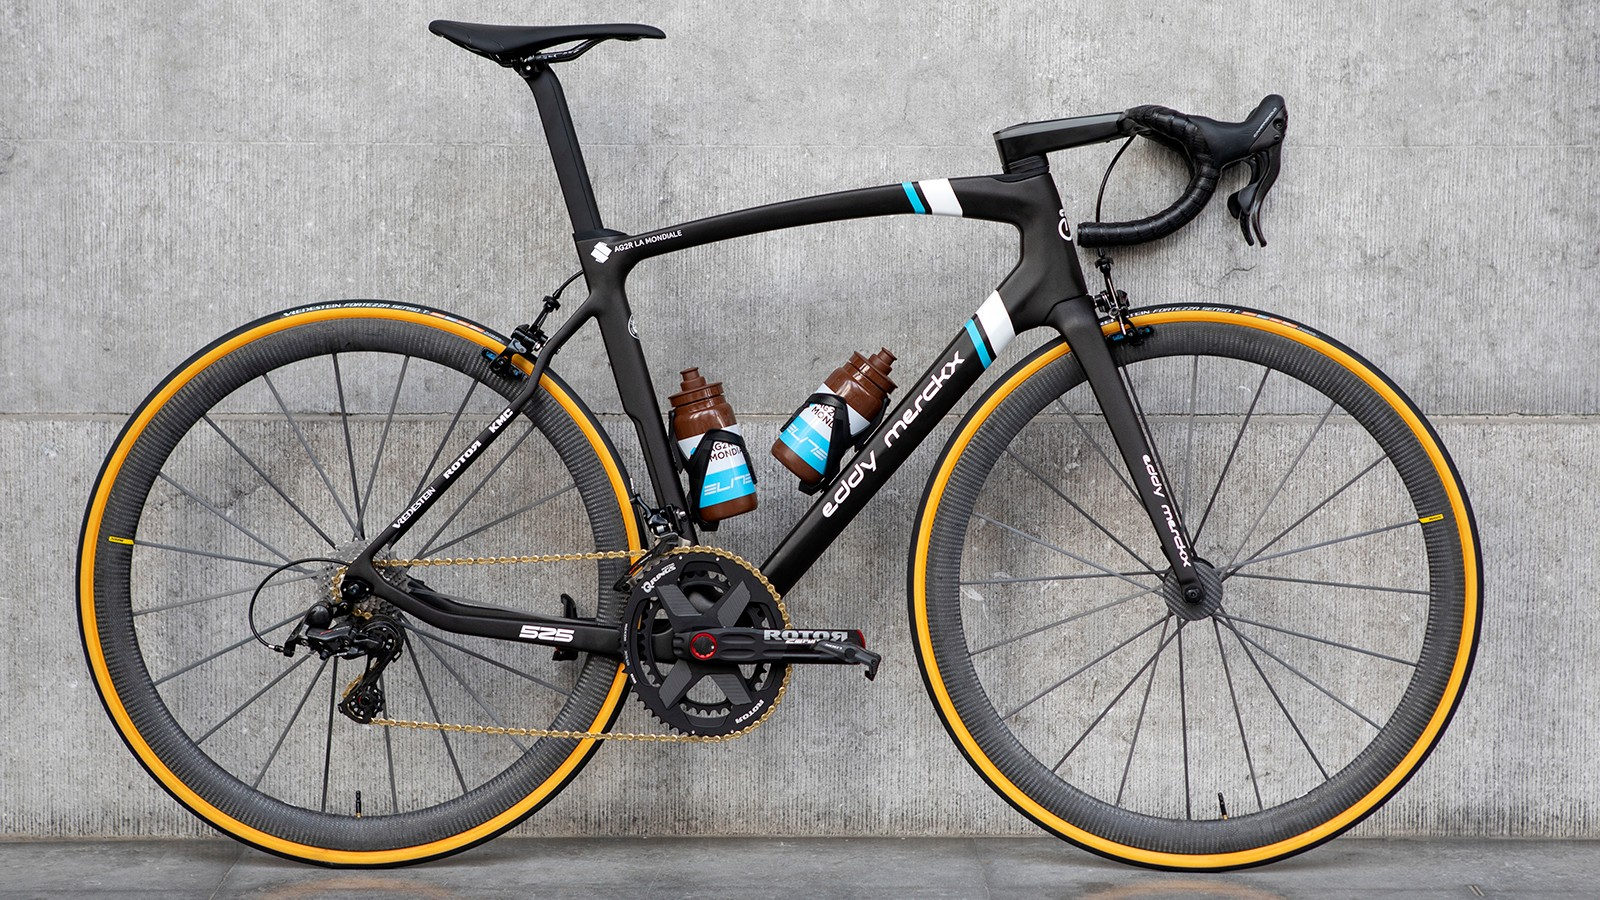 AG2R La Mondiale's Eddy Merckx for 2019